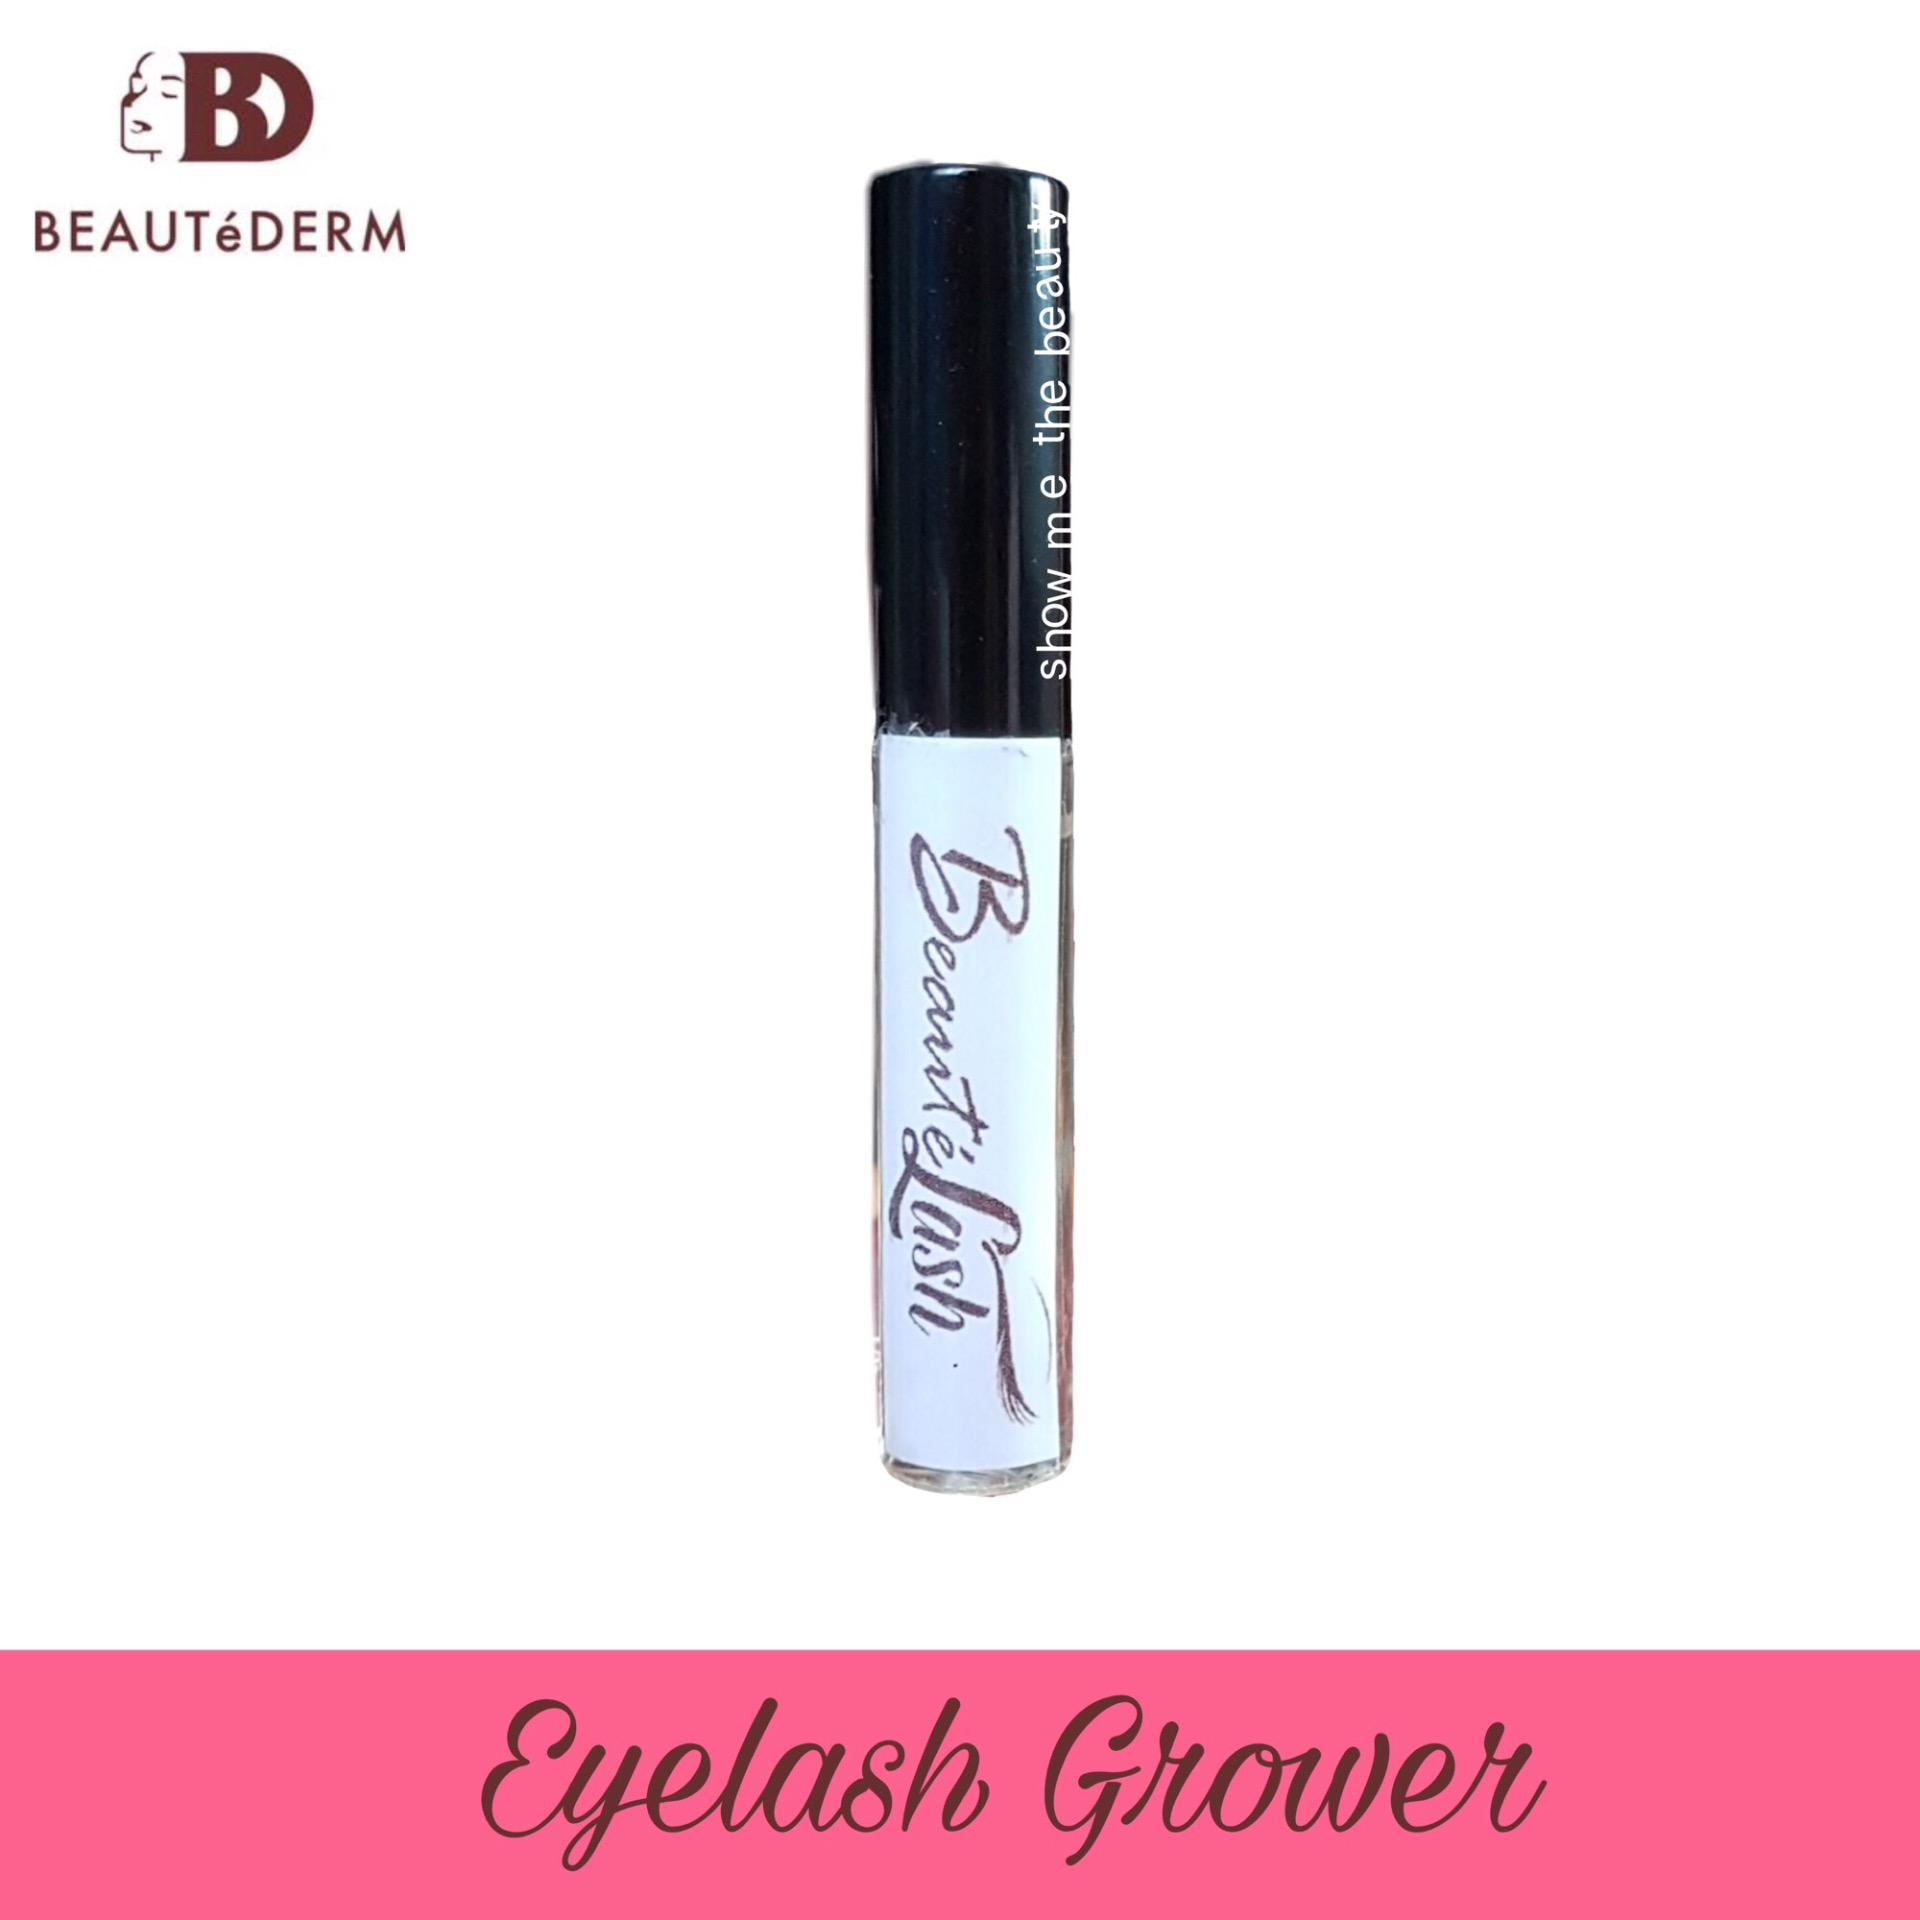 Beautederm Beaute Lash Eyelash Grower Small Philippines